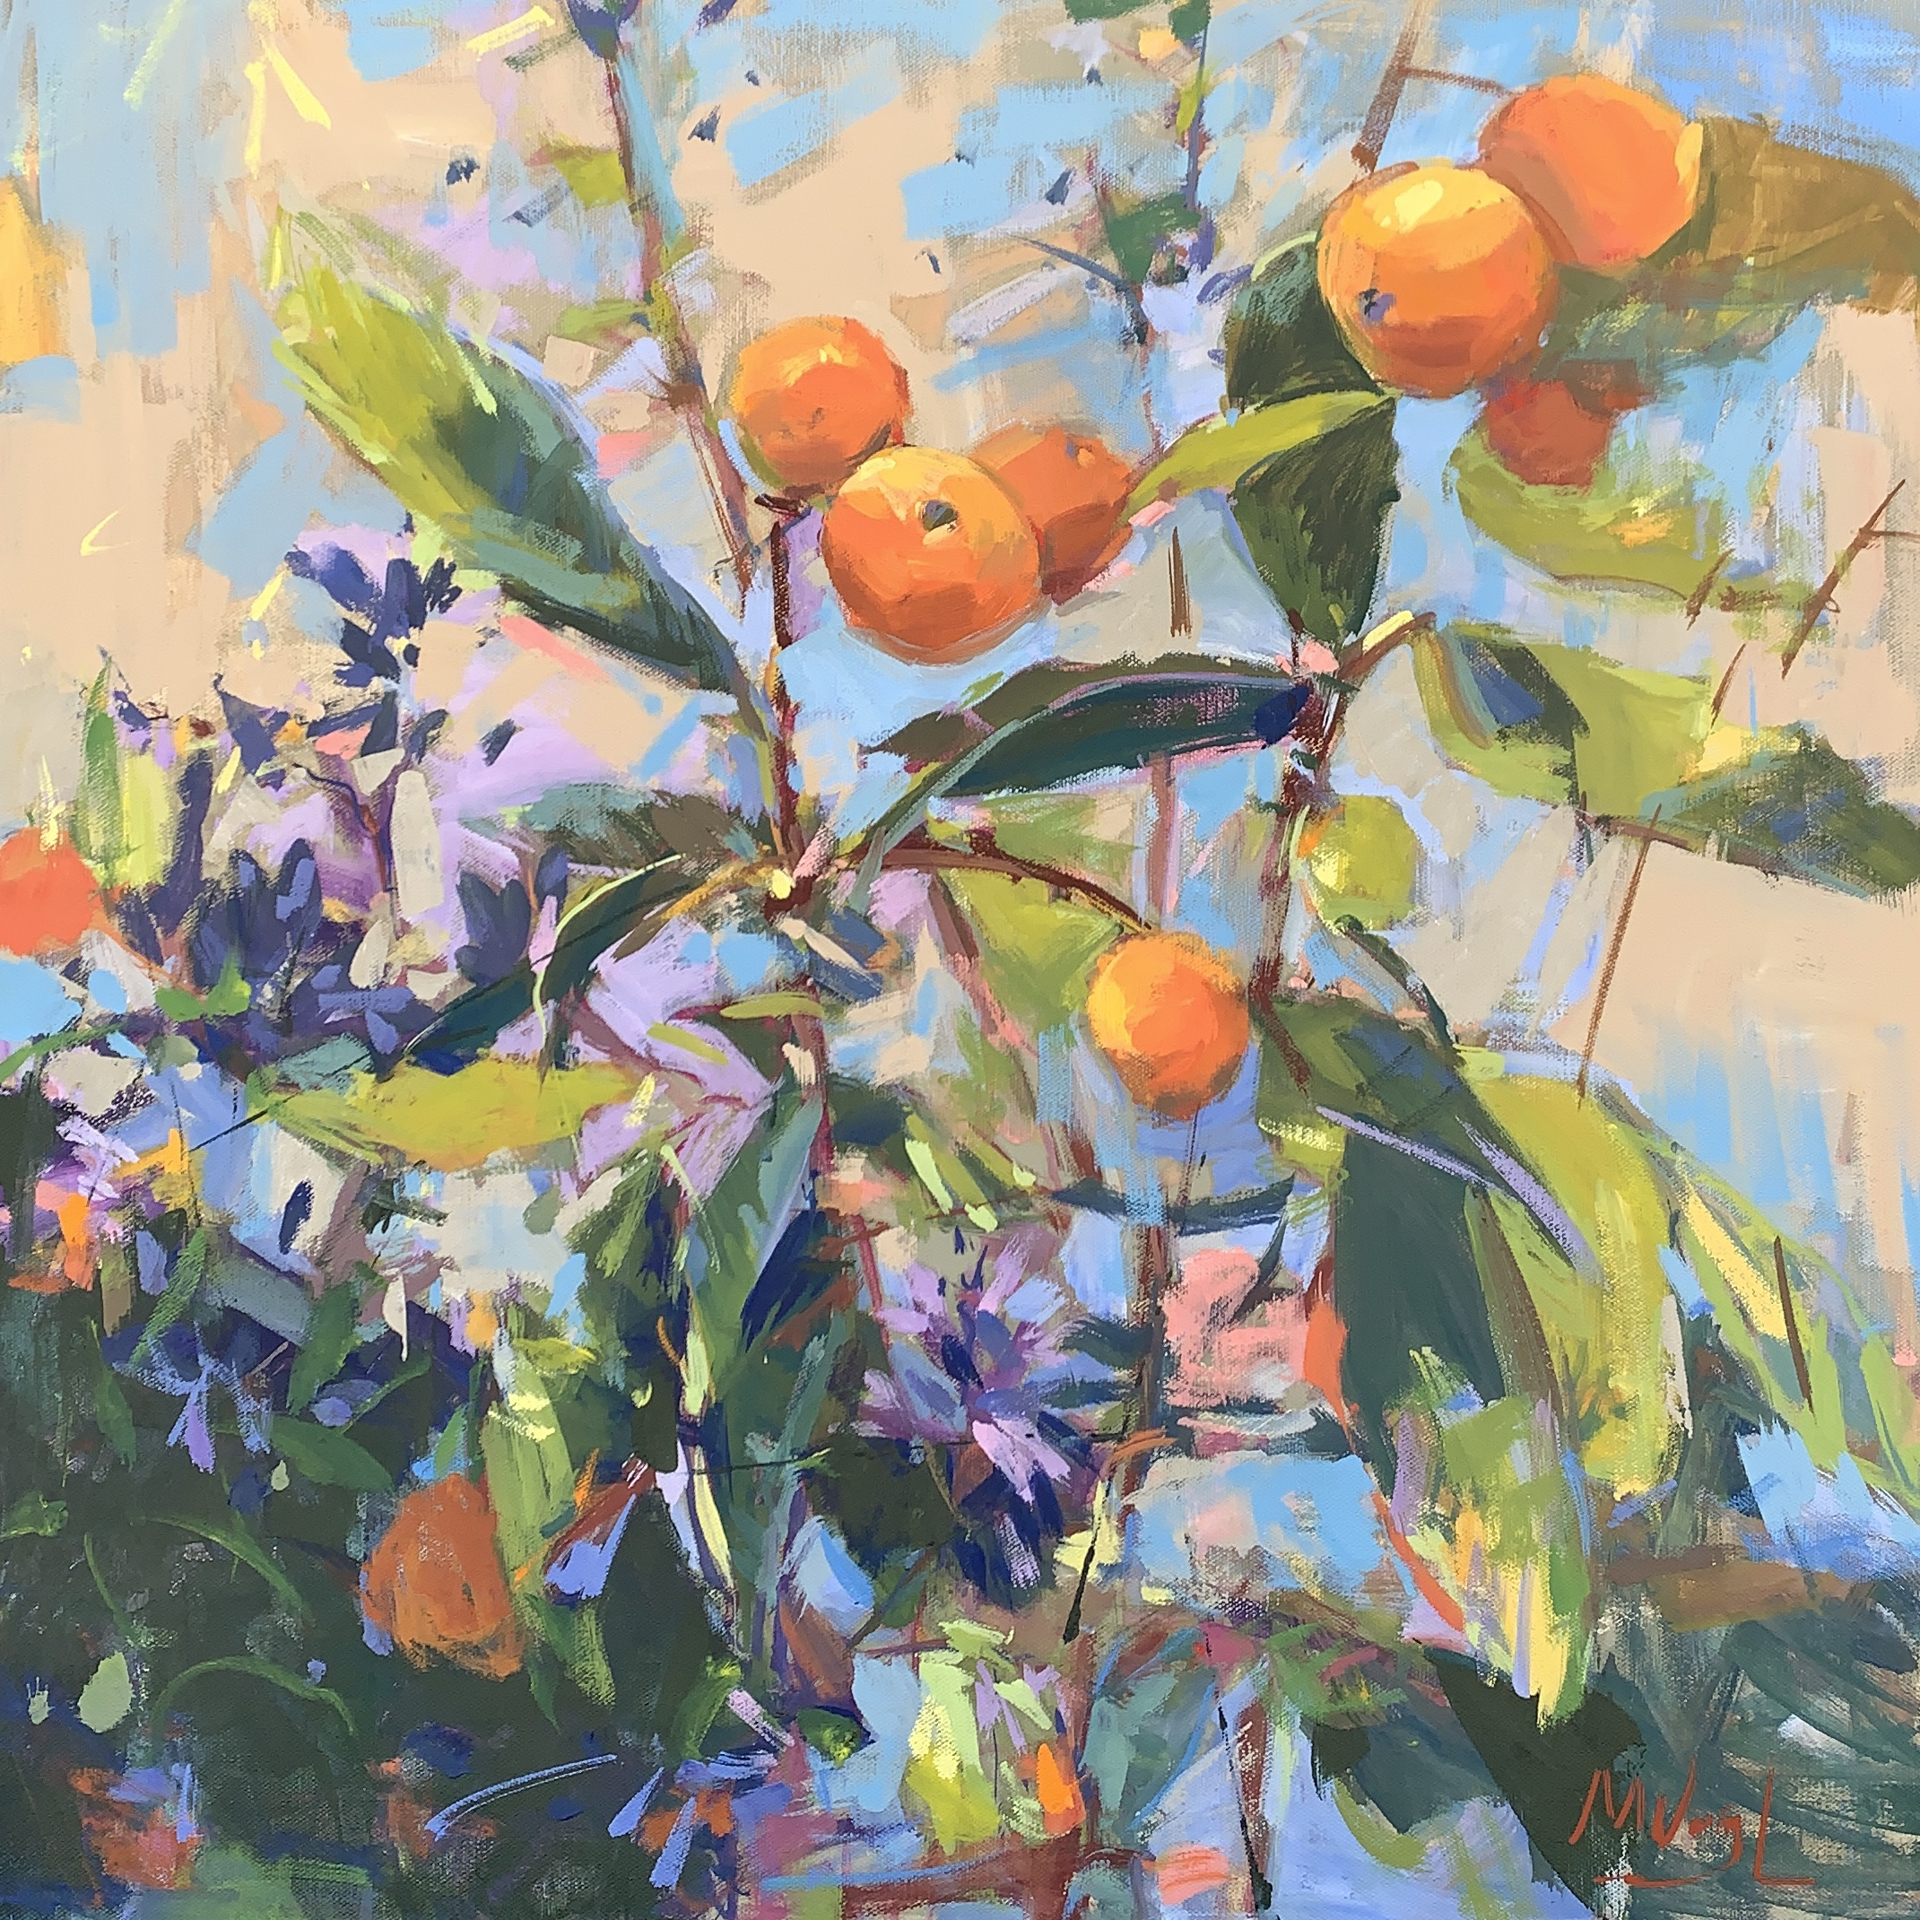 Loquat and Lavender by Marissa Vogl